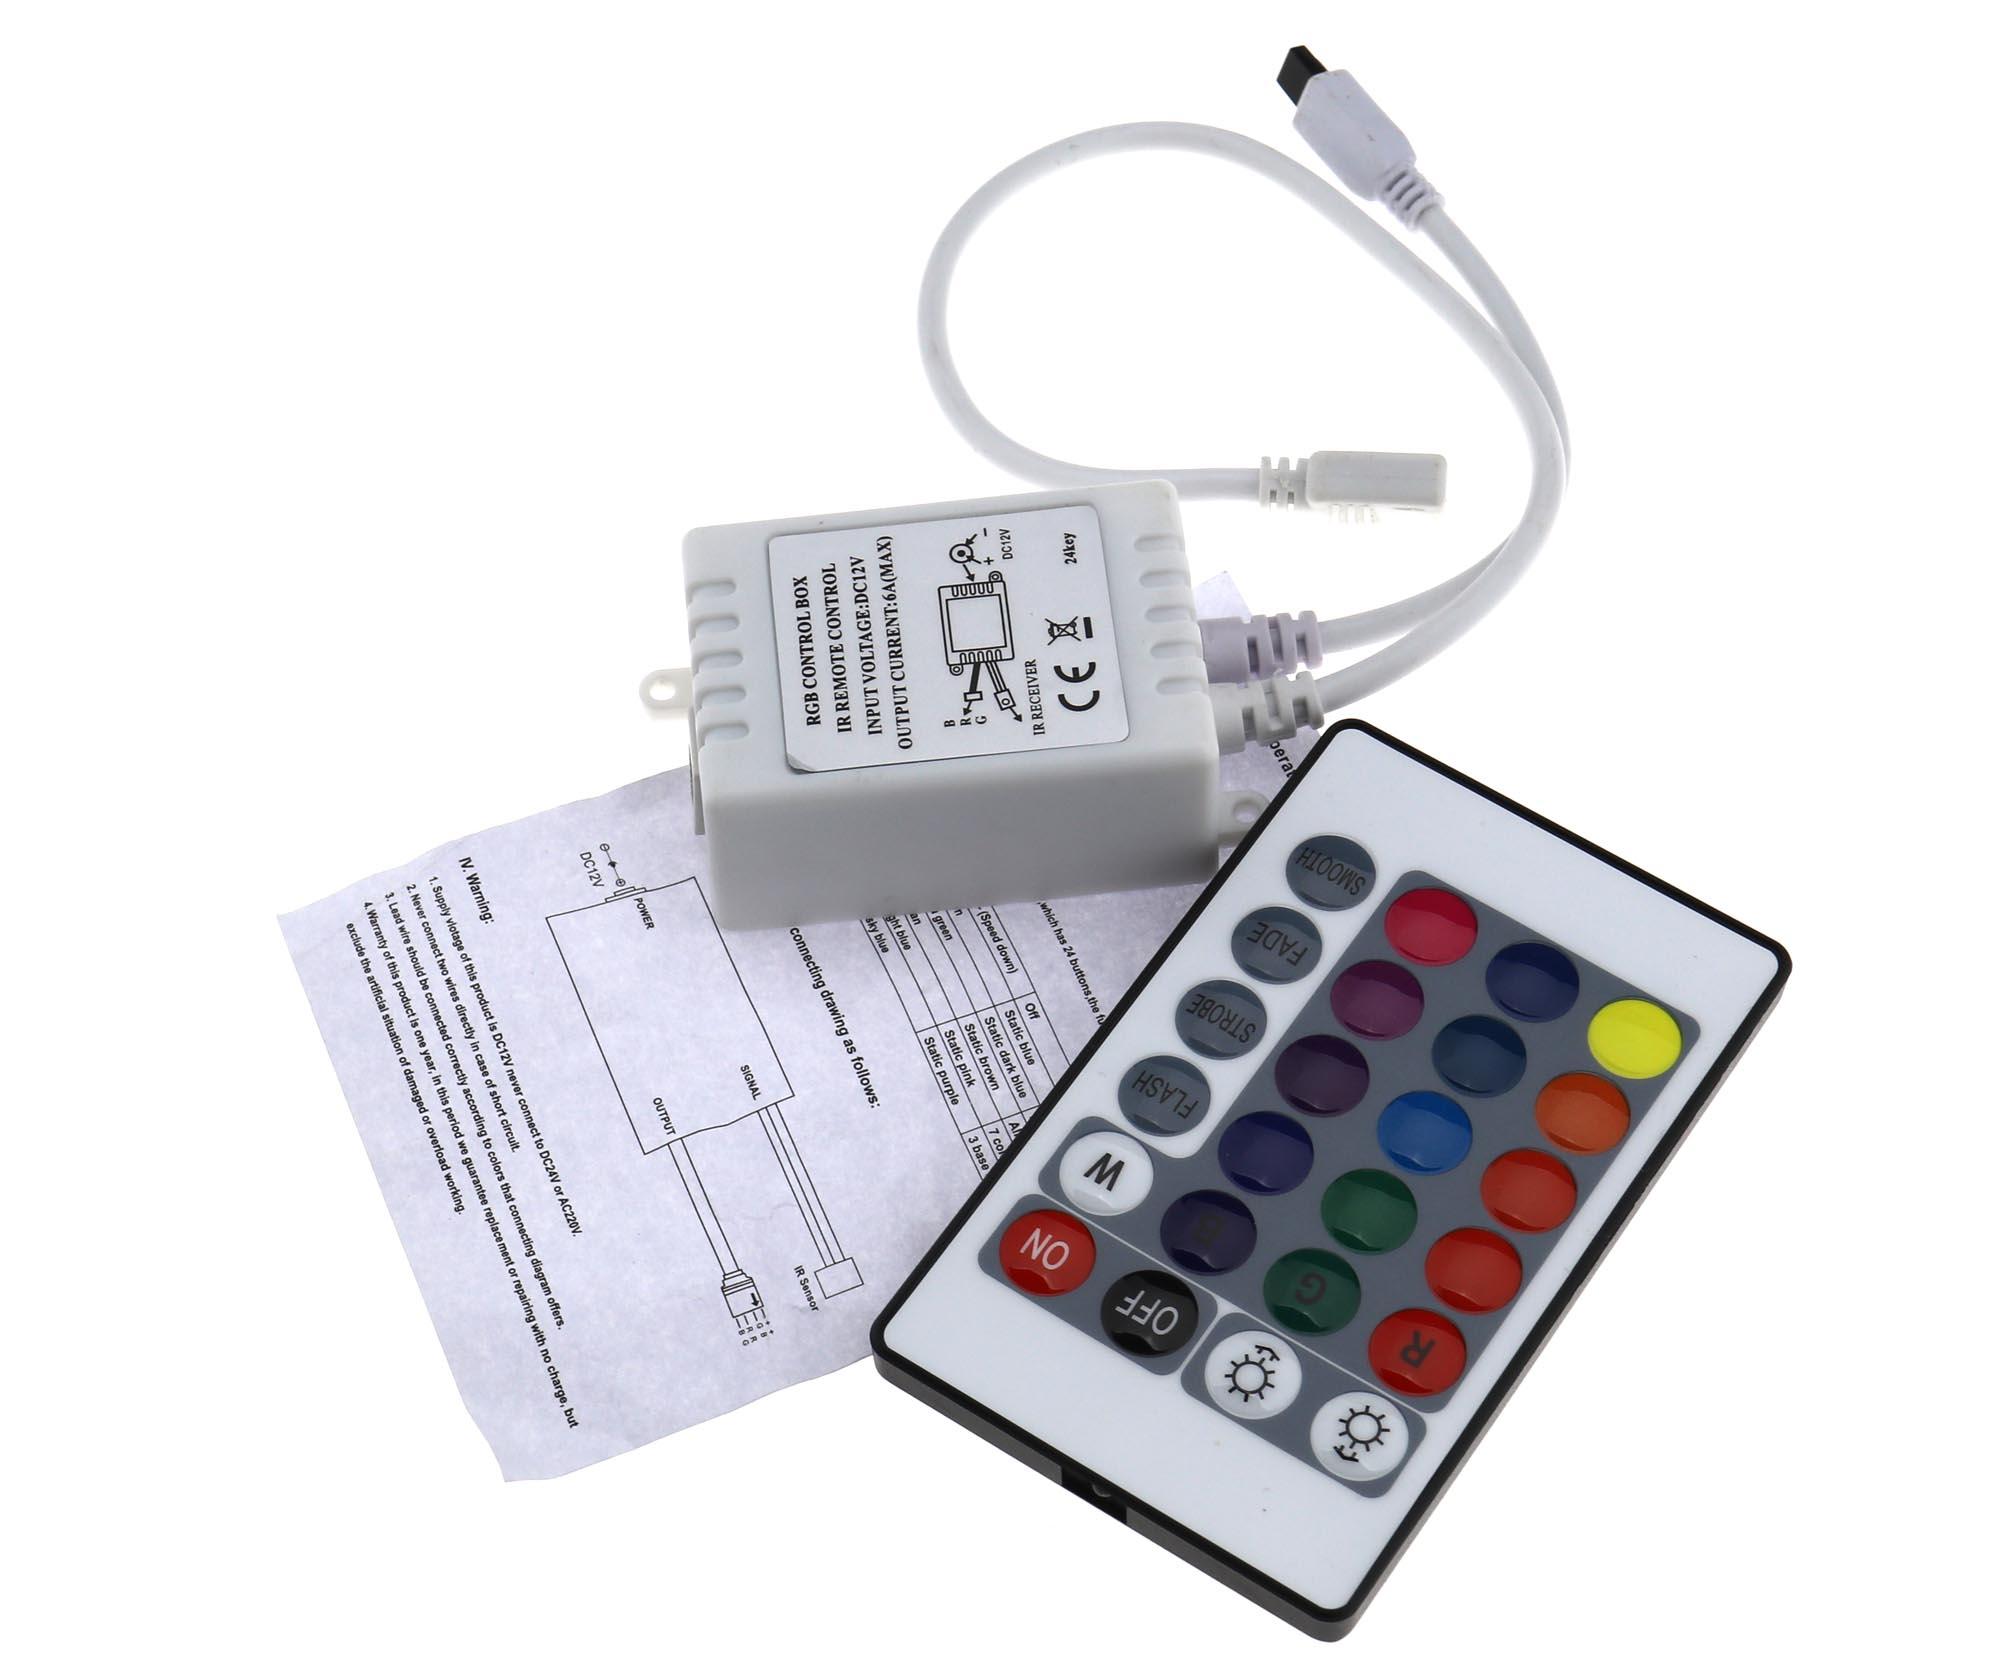 12v 24 Key Ir Remote Controller Box For Rgb Led 3528 5050 Smd Strip Irremotecontrolcircuitdiagram2jpg 1 Pcs Control